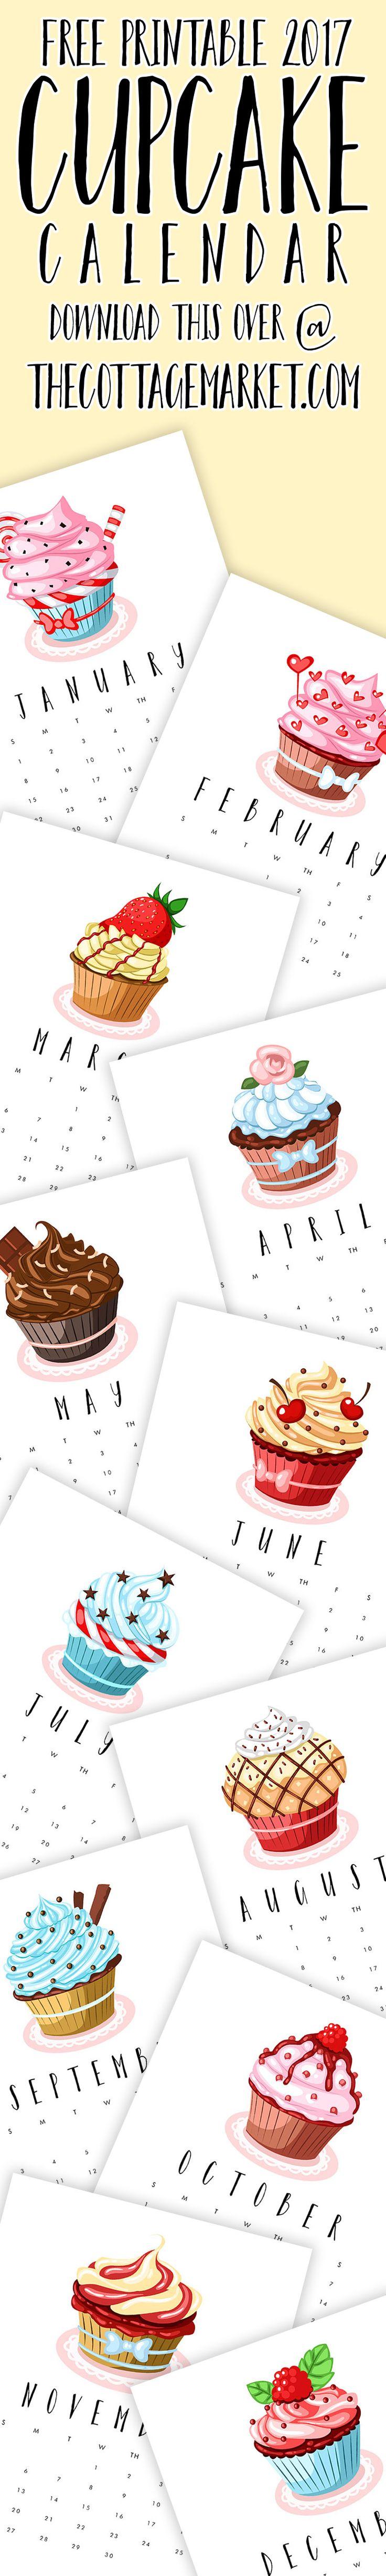 Free Printable 2017 Cupcake Calendar...Come and Celebrate Baking Week!